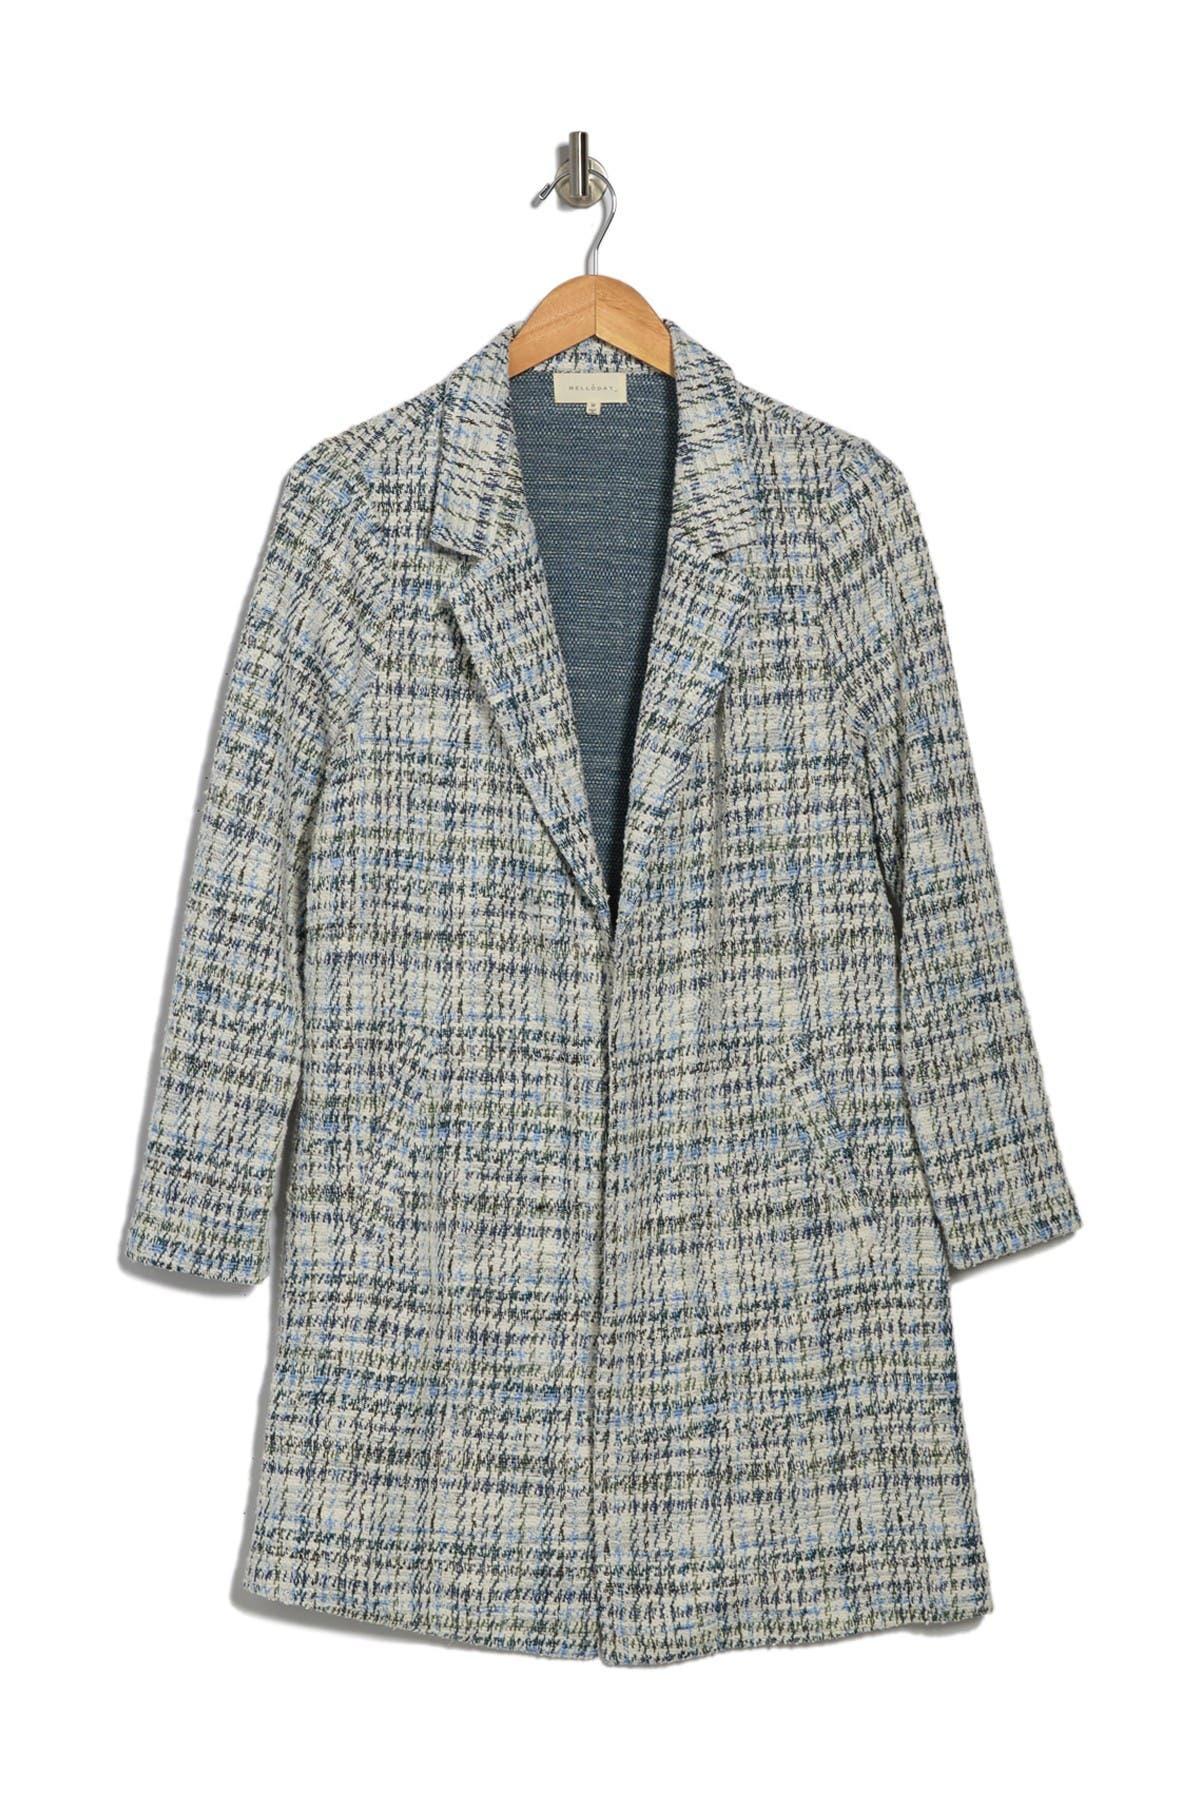 MELLODAY Plaid Knit Coat